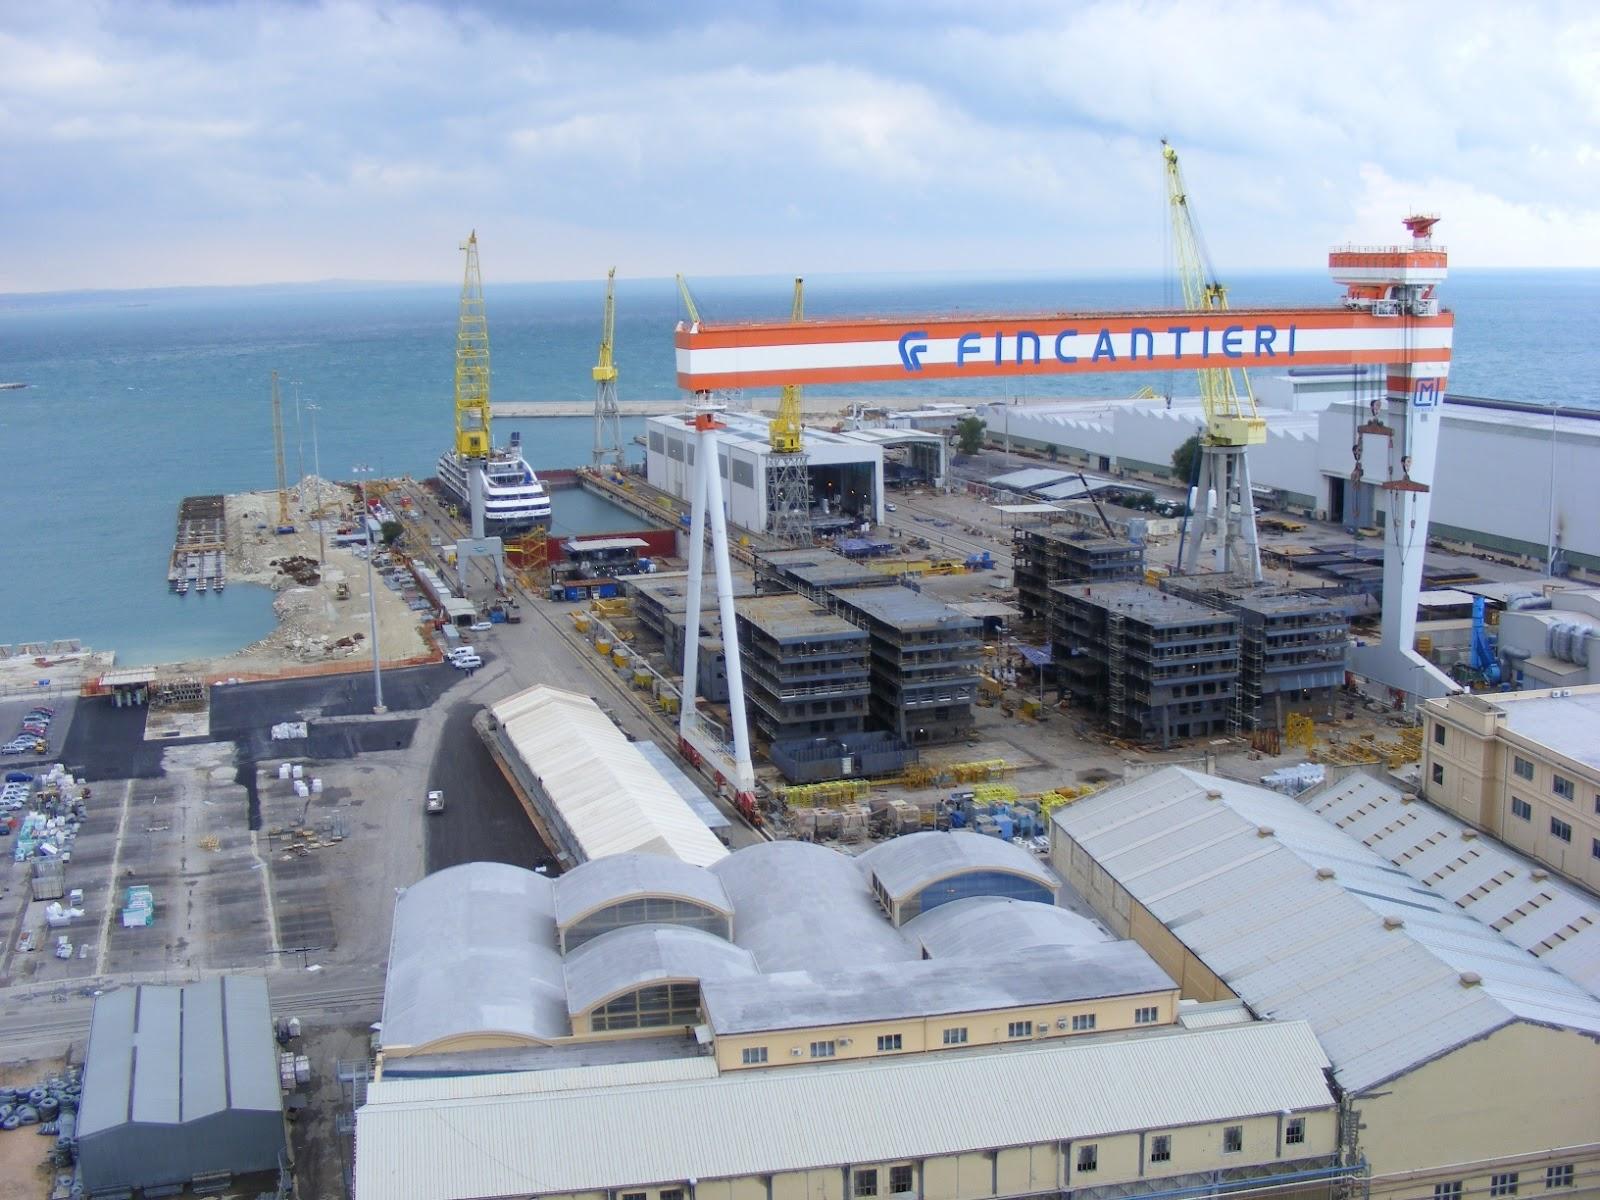 Fincantieri MARGHERA SHIPYARD